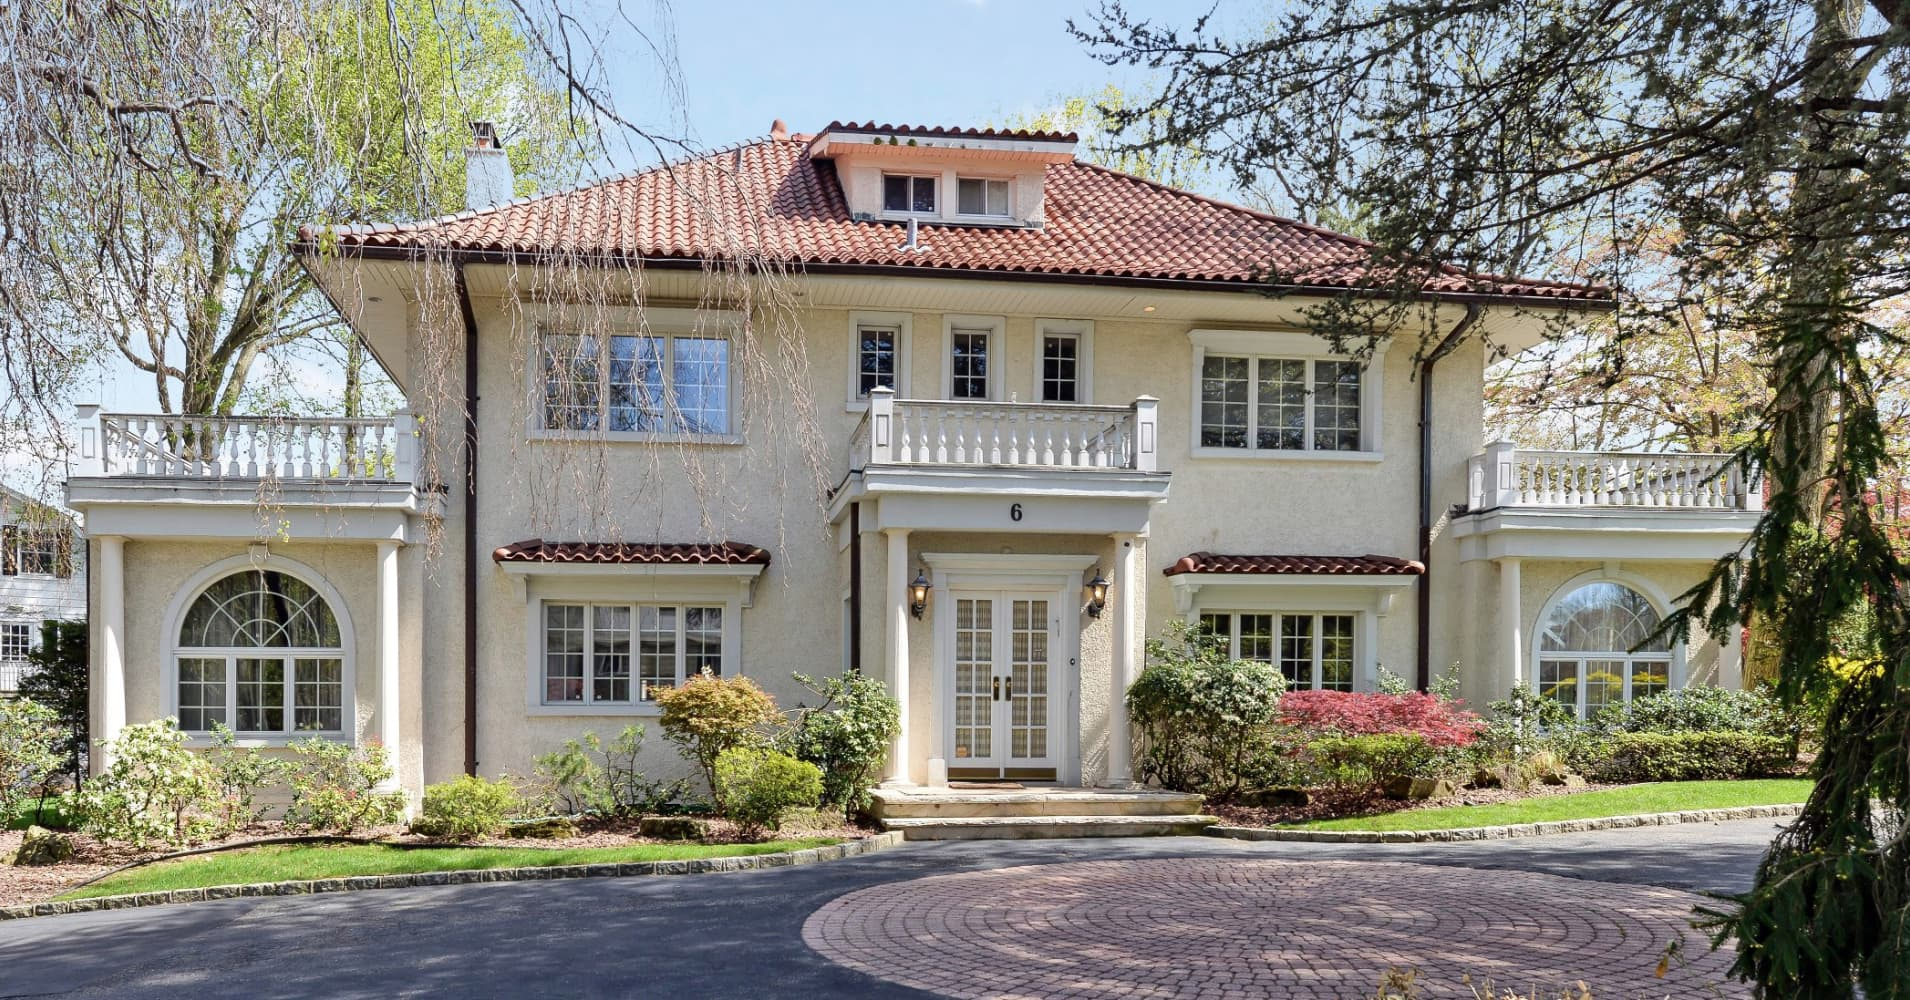 Iconic 39 Gatsby 39 House Hits The Market